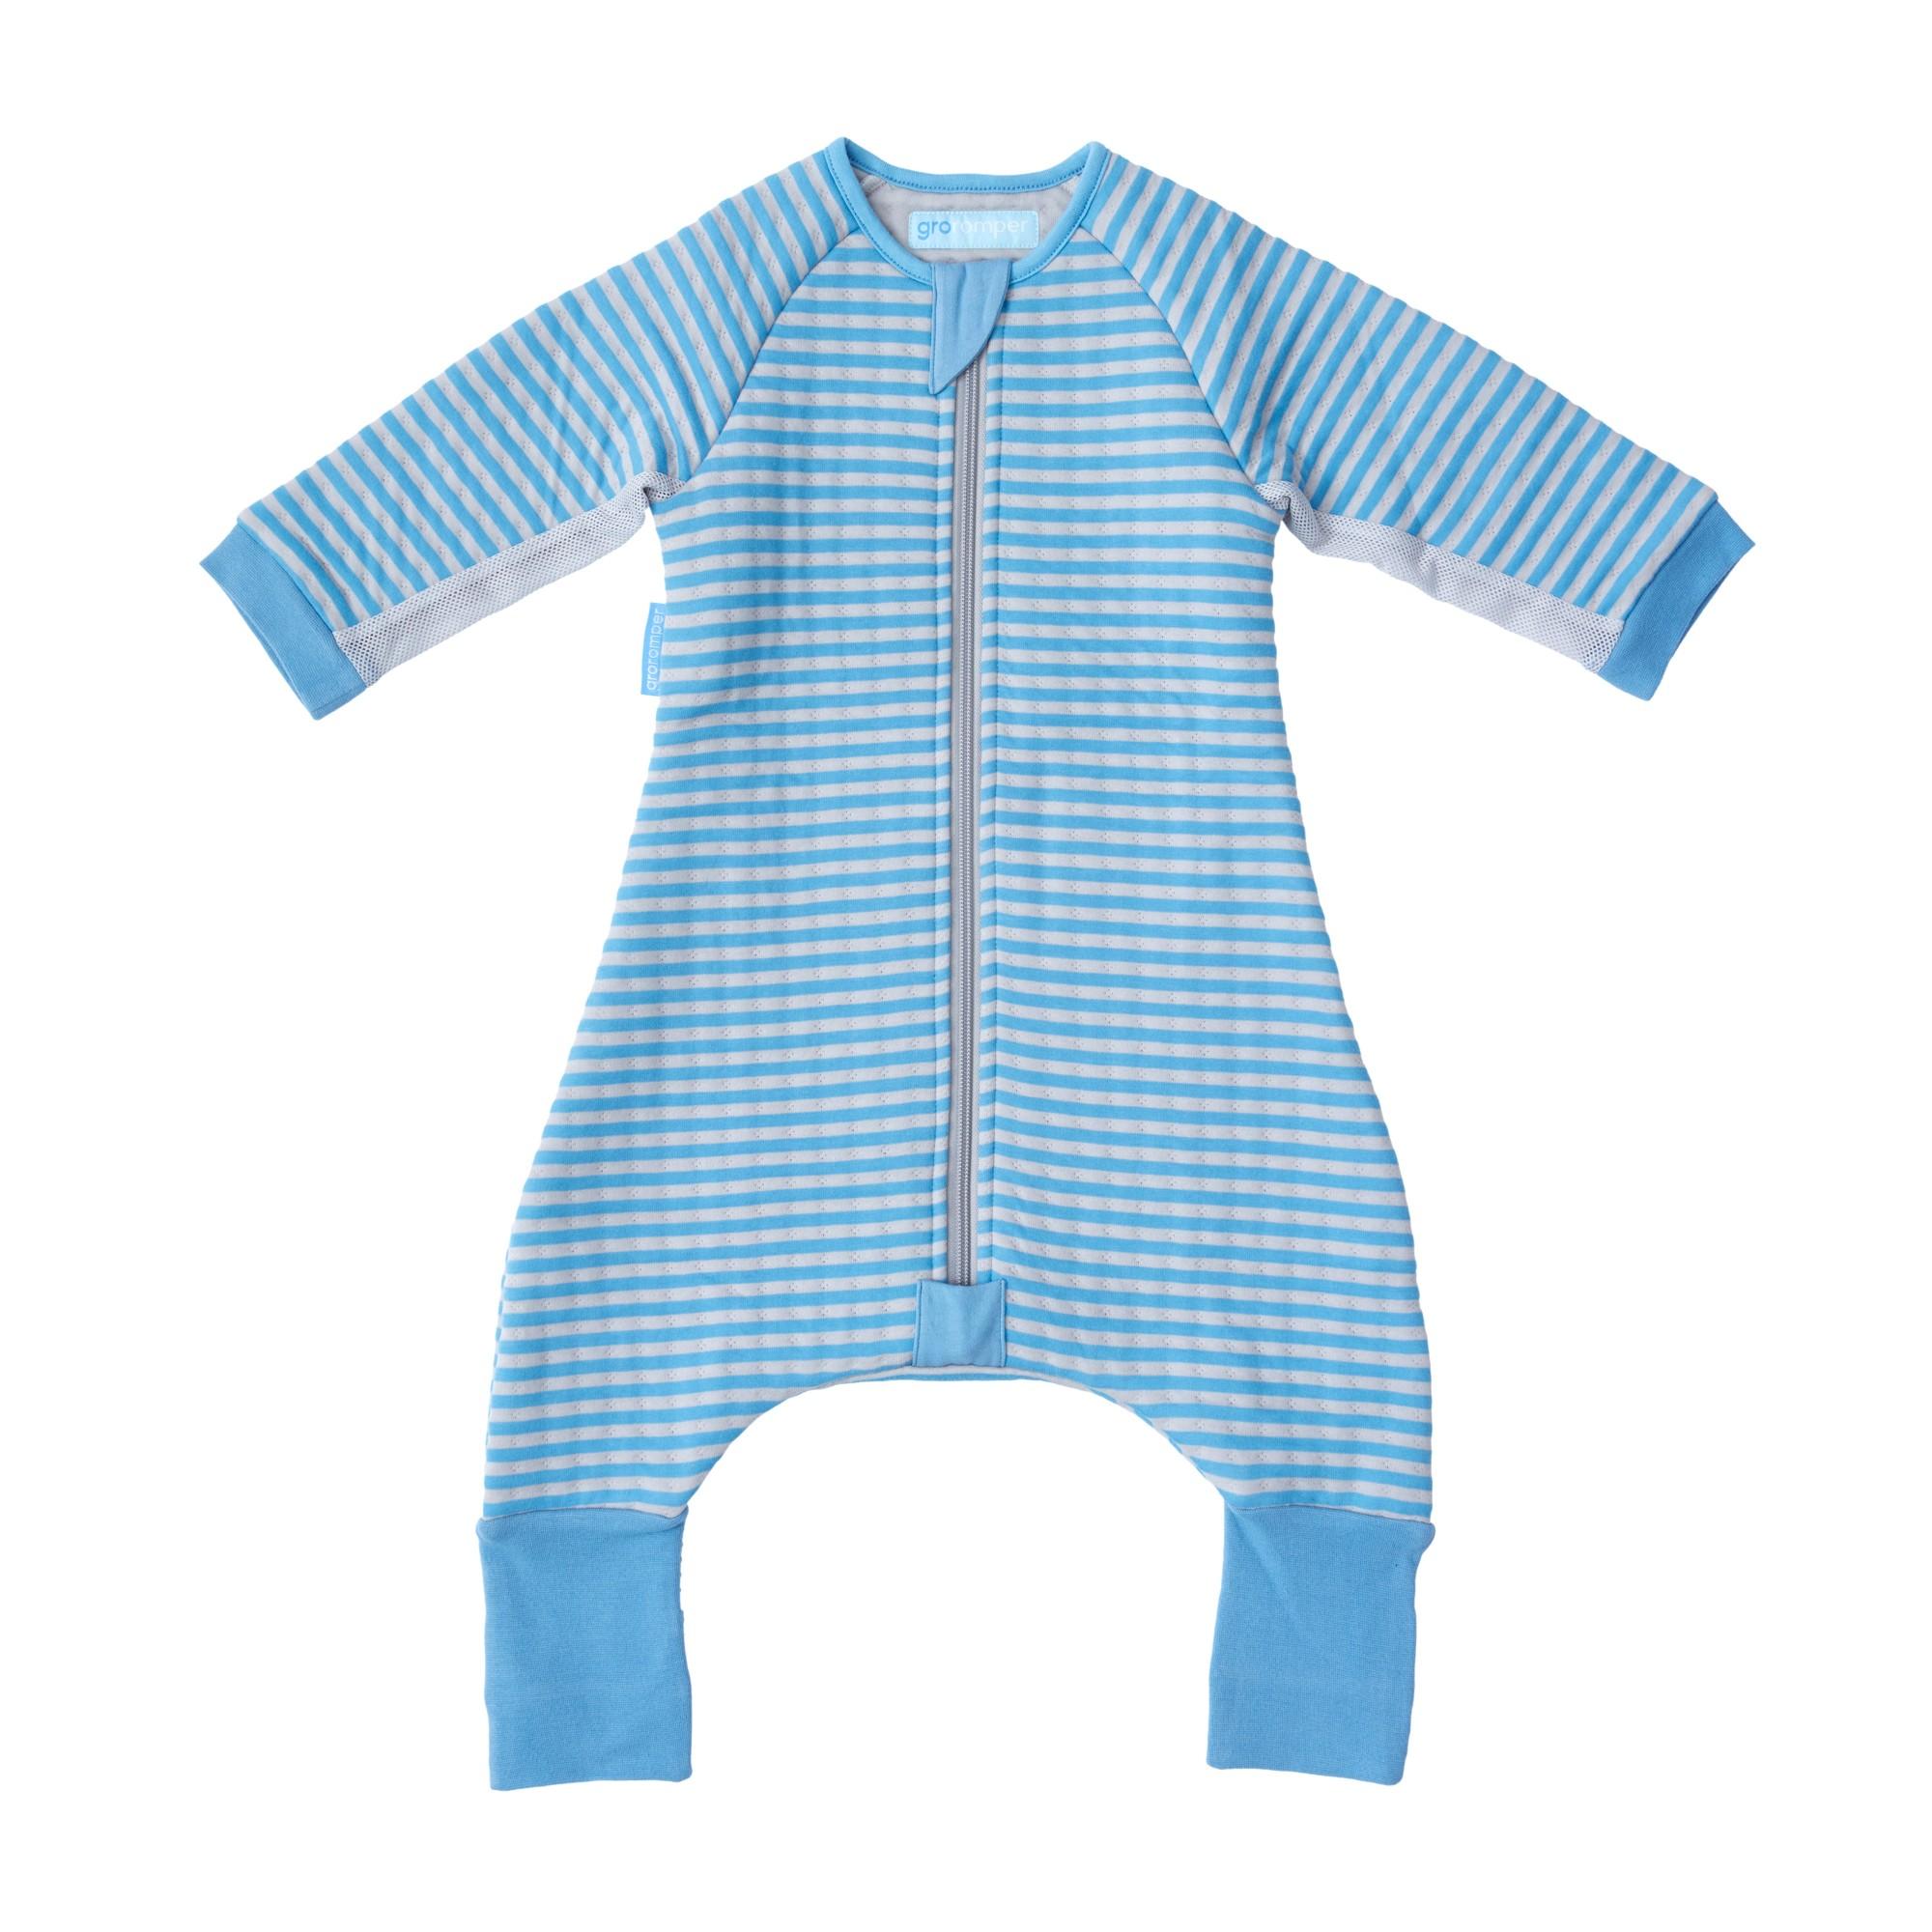 Body pentru Bebelusi Gros, Dungi Albastre, 12 - 24 luni, Gro